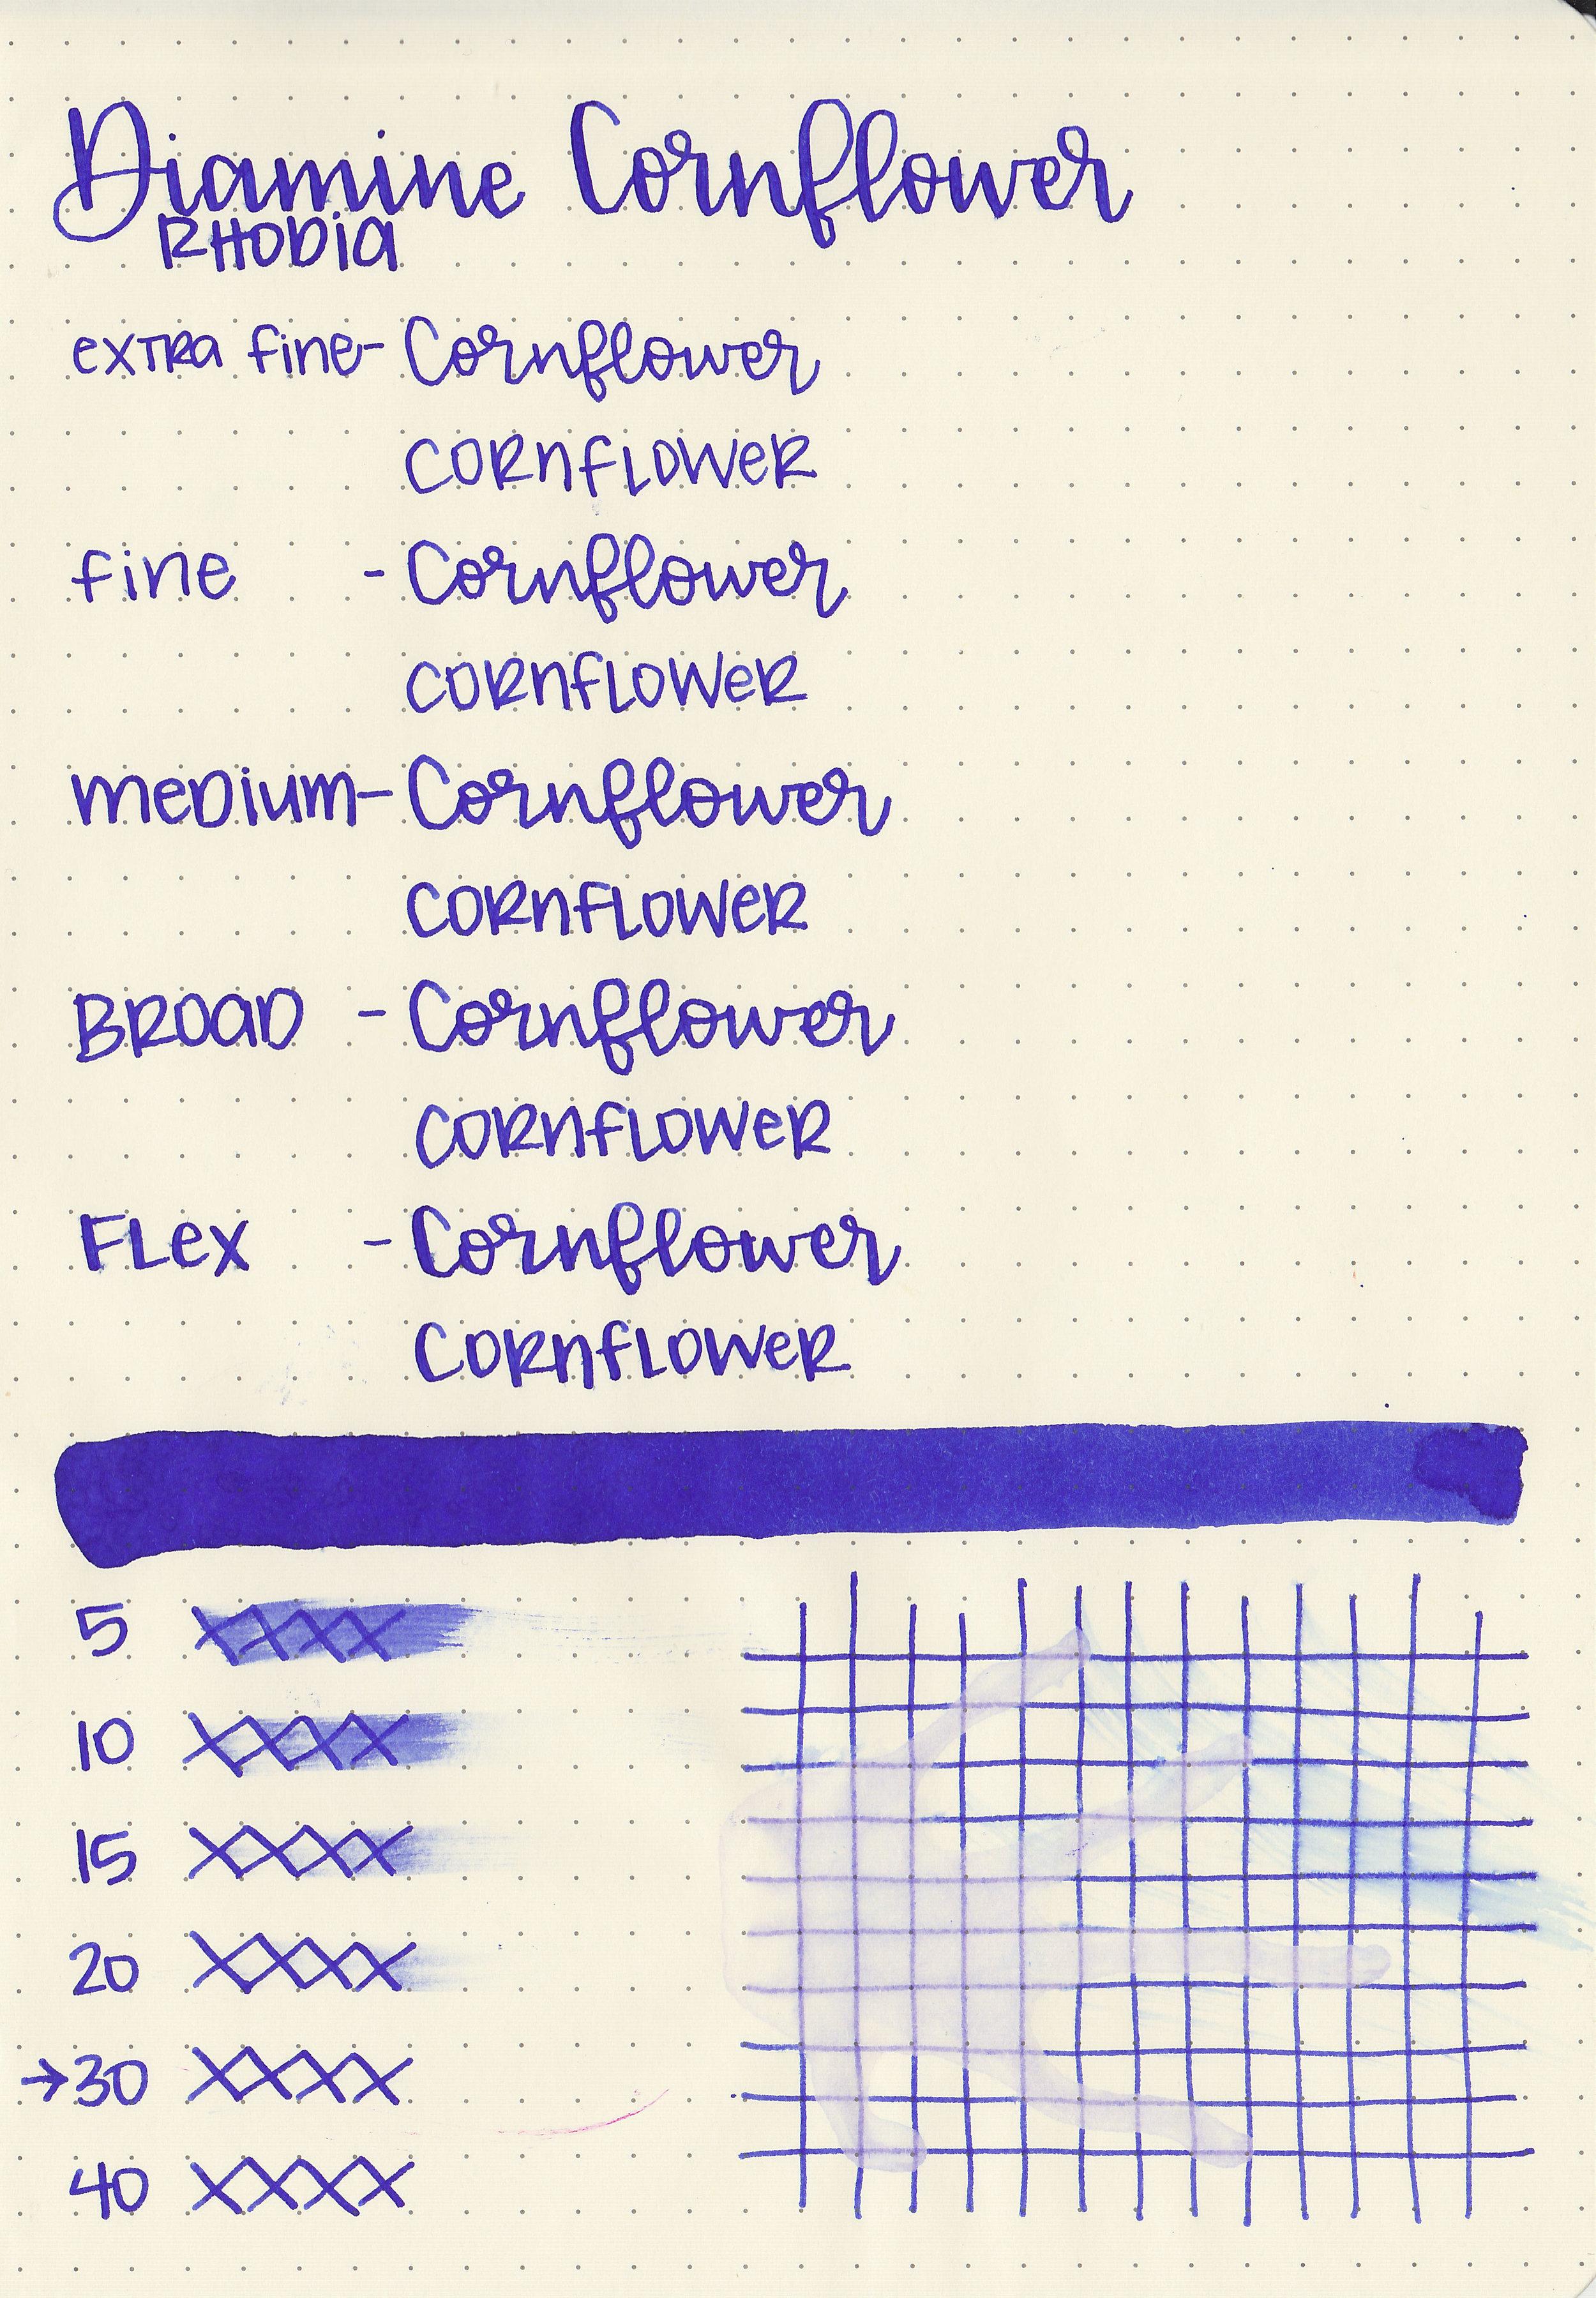 d-cornflower-5.jpg